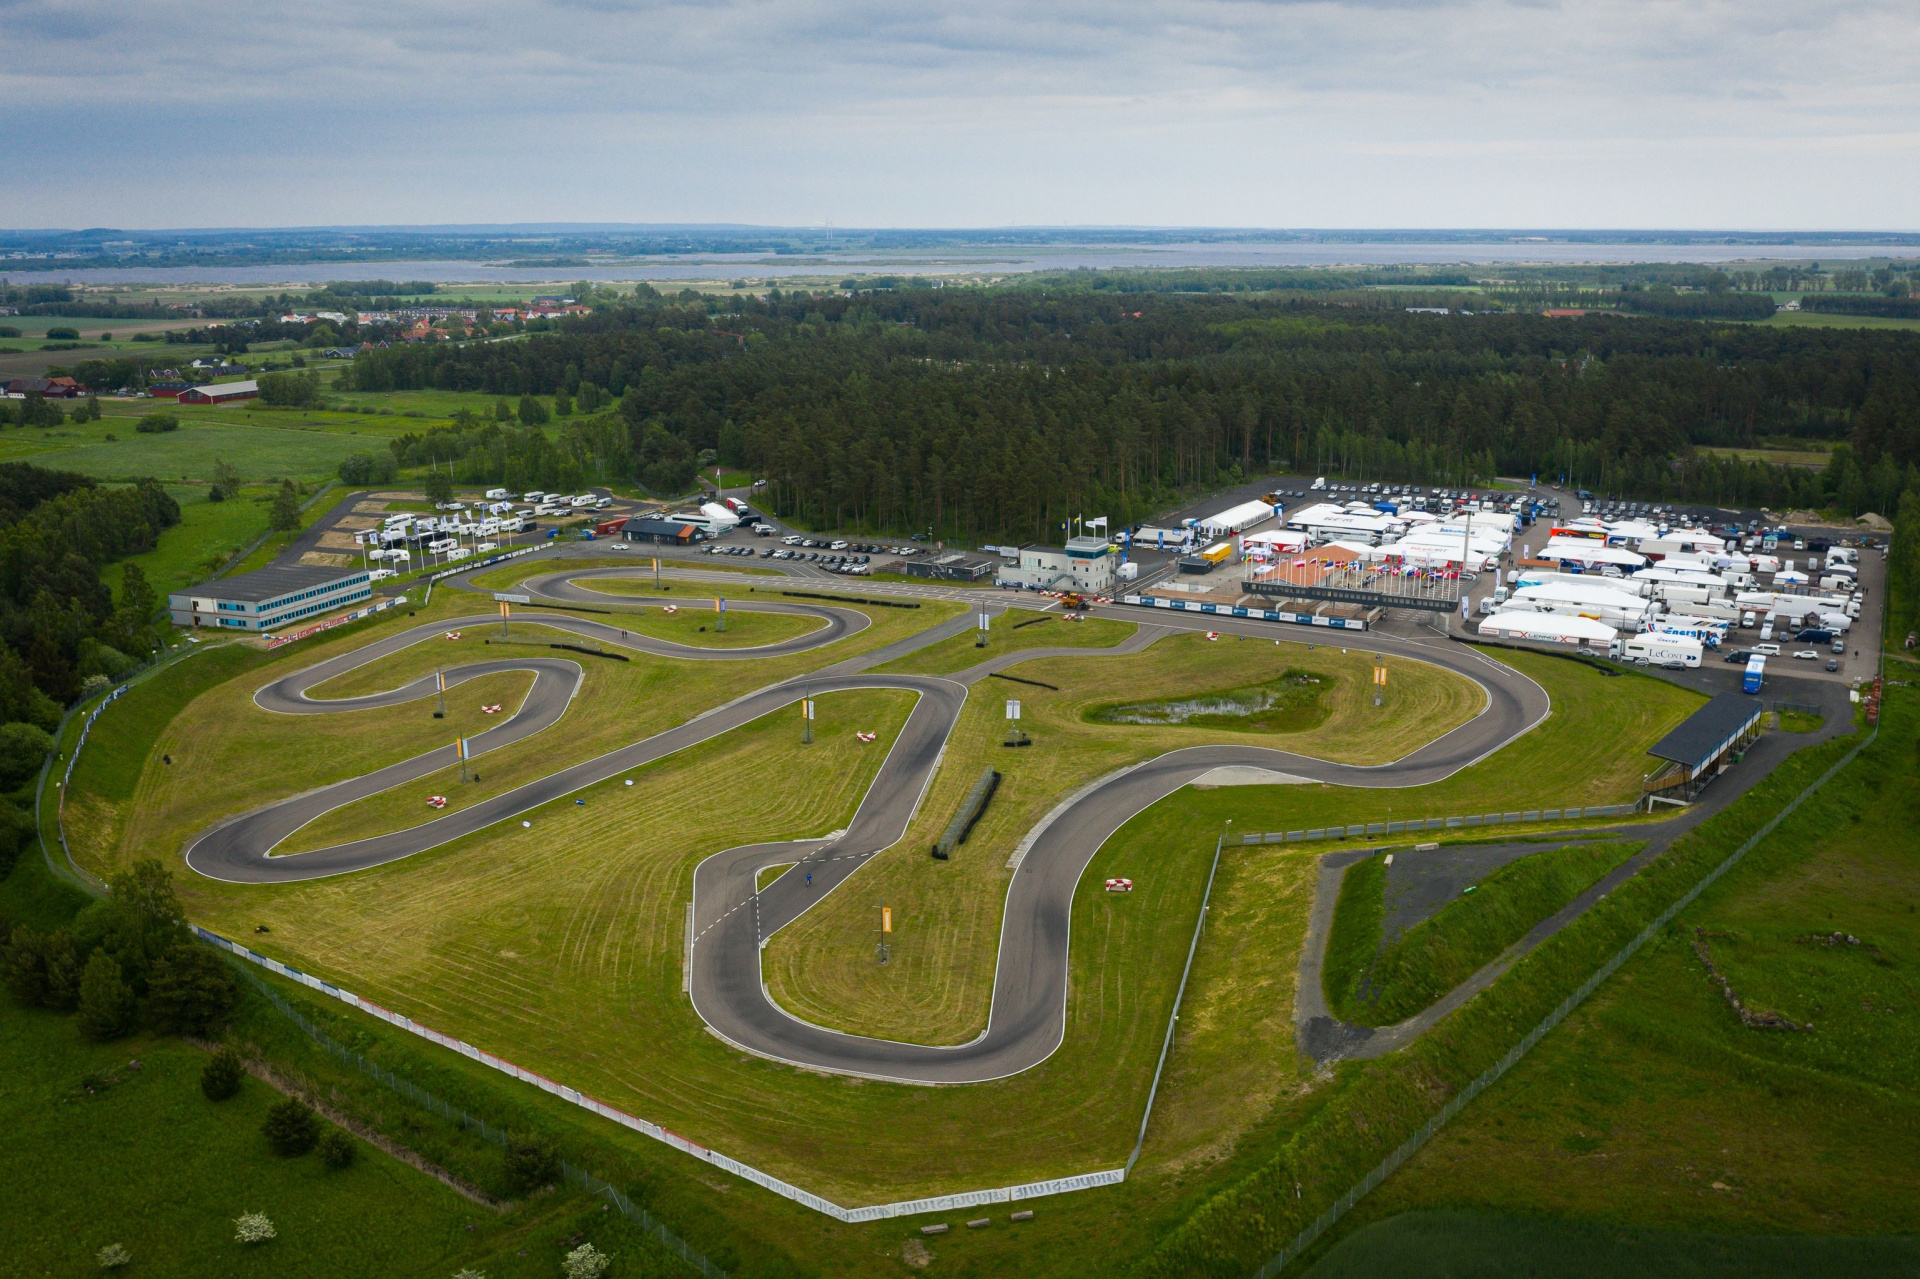 FIA Karting World Championship KZ/KZ2 – Weekend Mondiale a Kristianstad